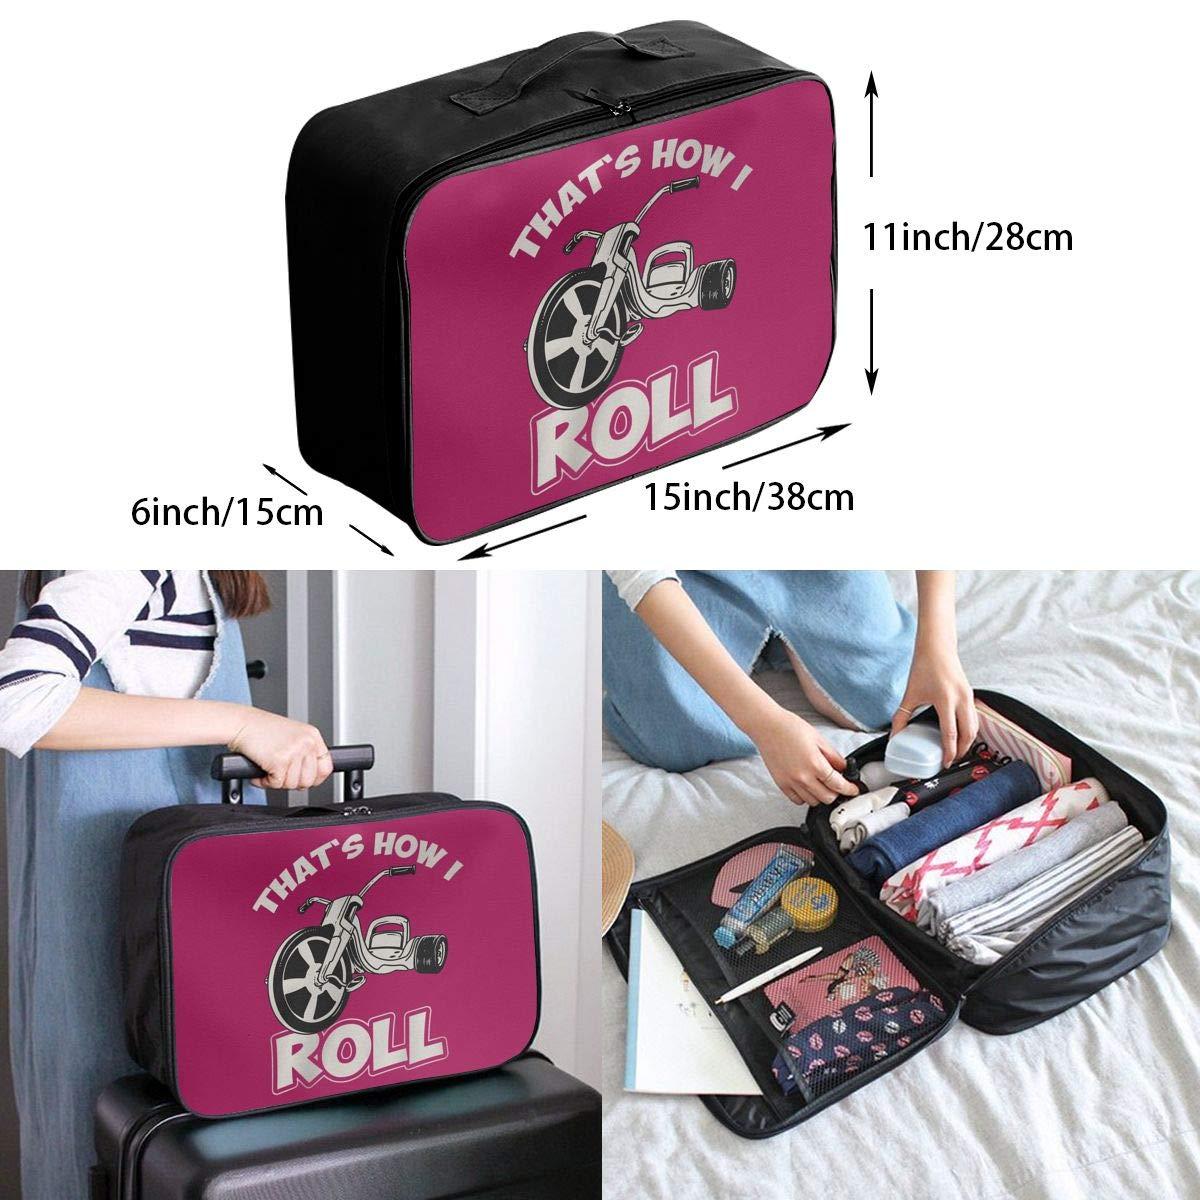 Travel Luggage Duffle Bag Lightweight Portable Handbag Thats How I Roll Large Capacity Waterproof Foldable Storage Tote